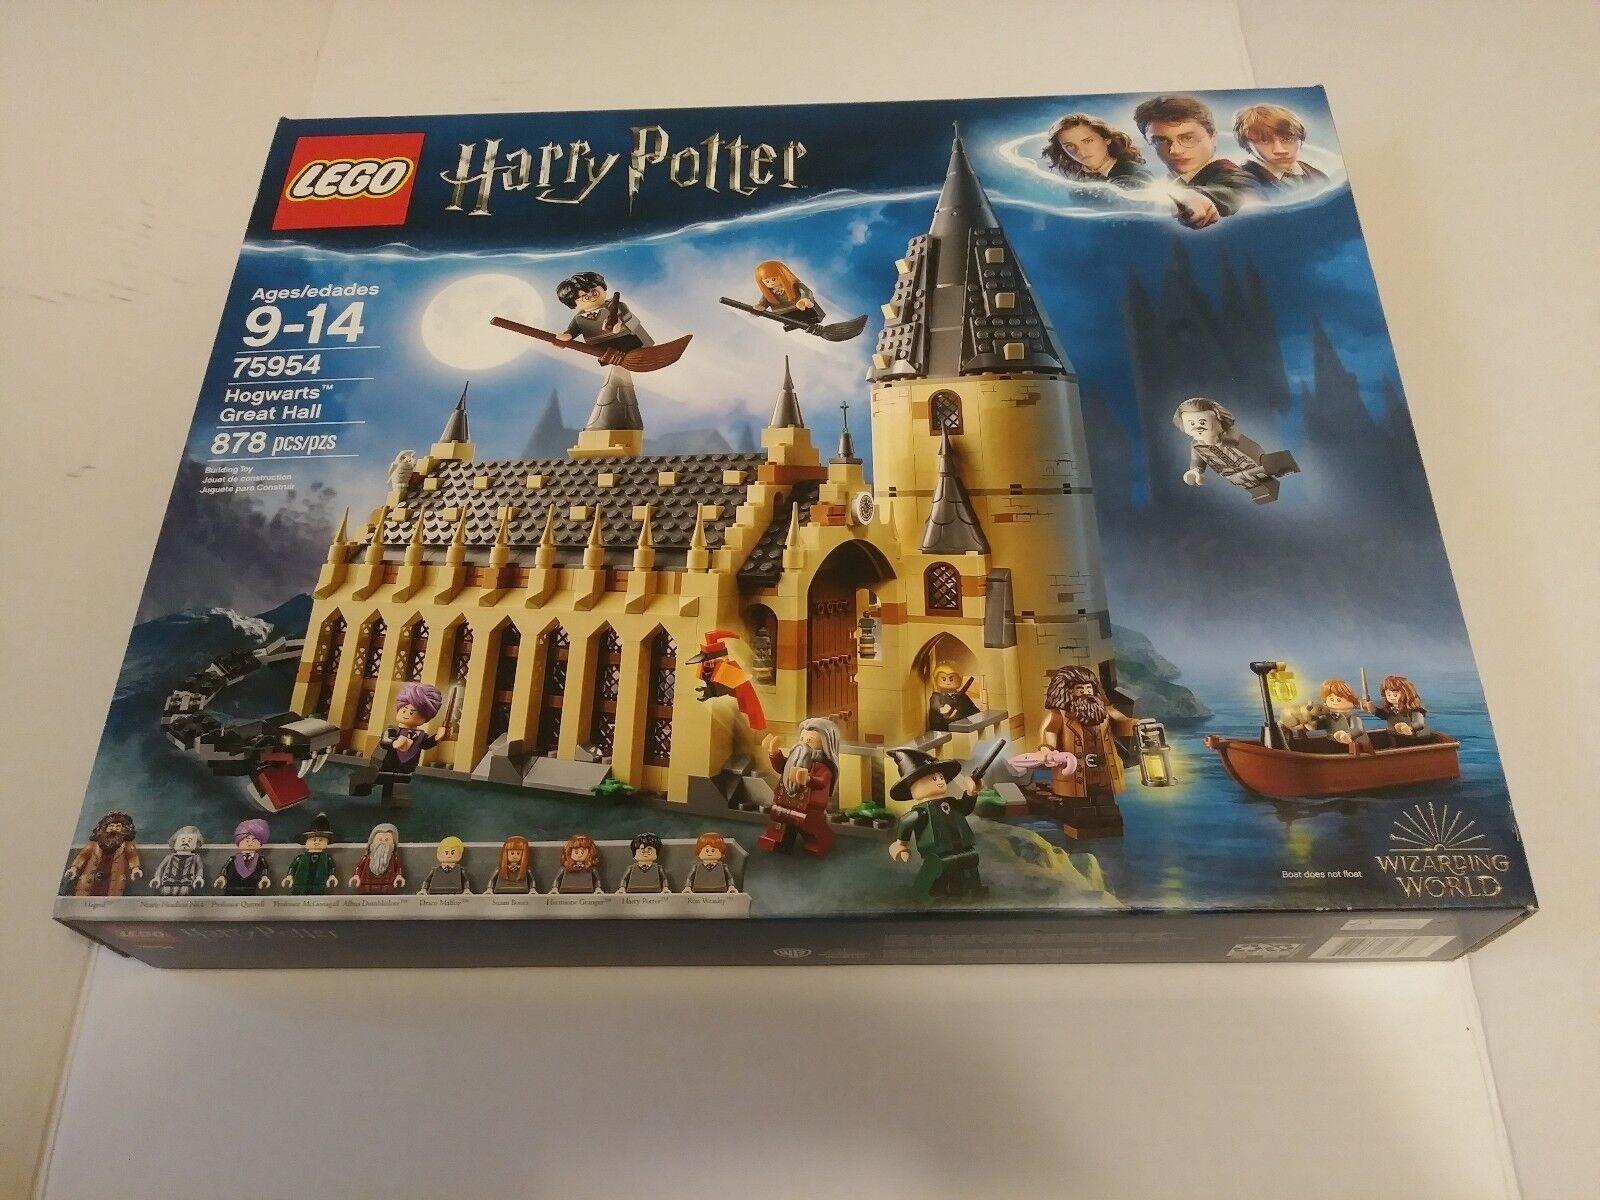 LEGO 75954 Harry Potter Hogwarts Great Hall Wizarding World World World 878 Pieces New 2018 3b0618